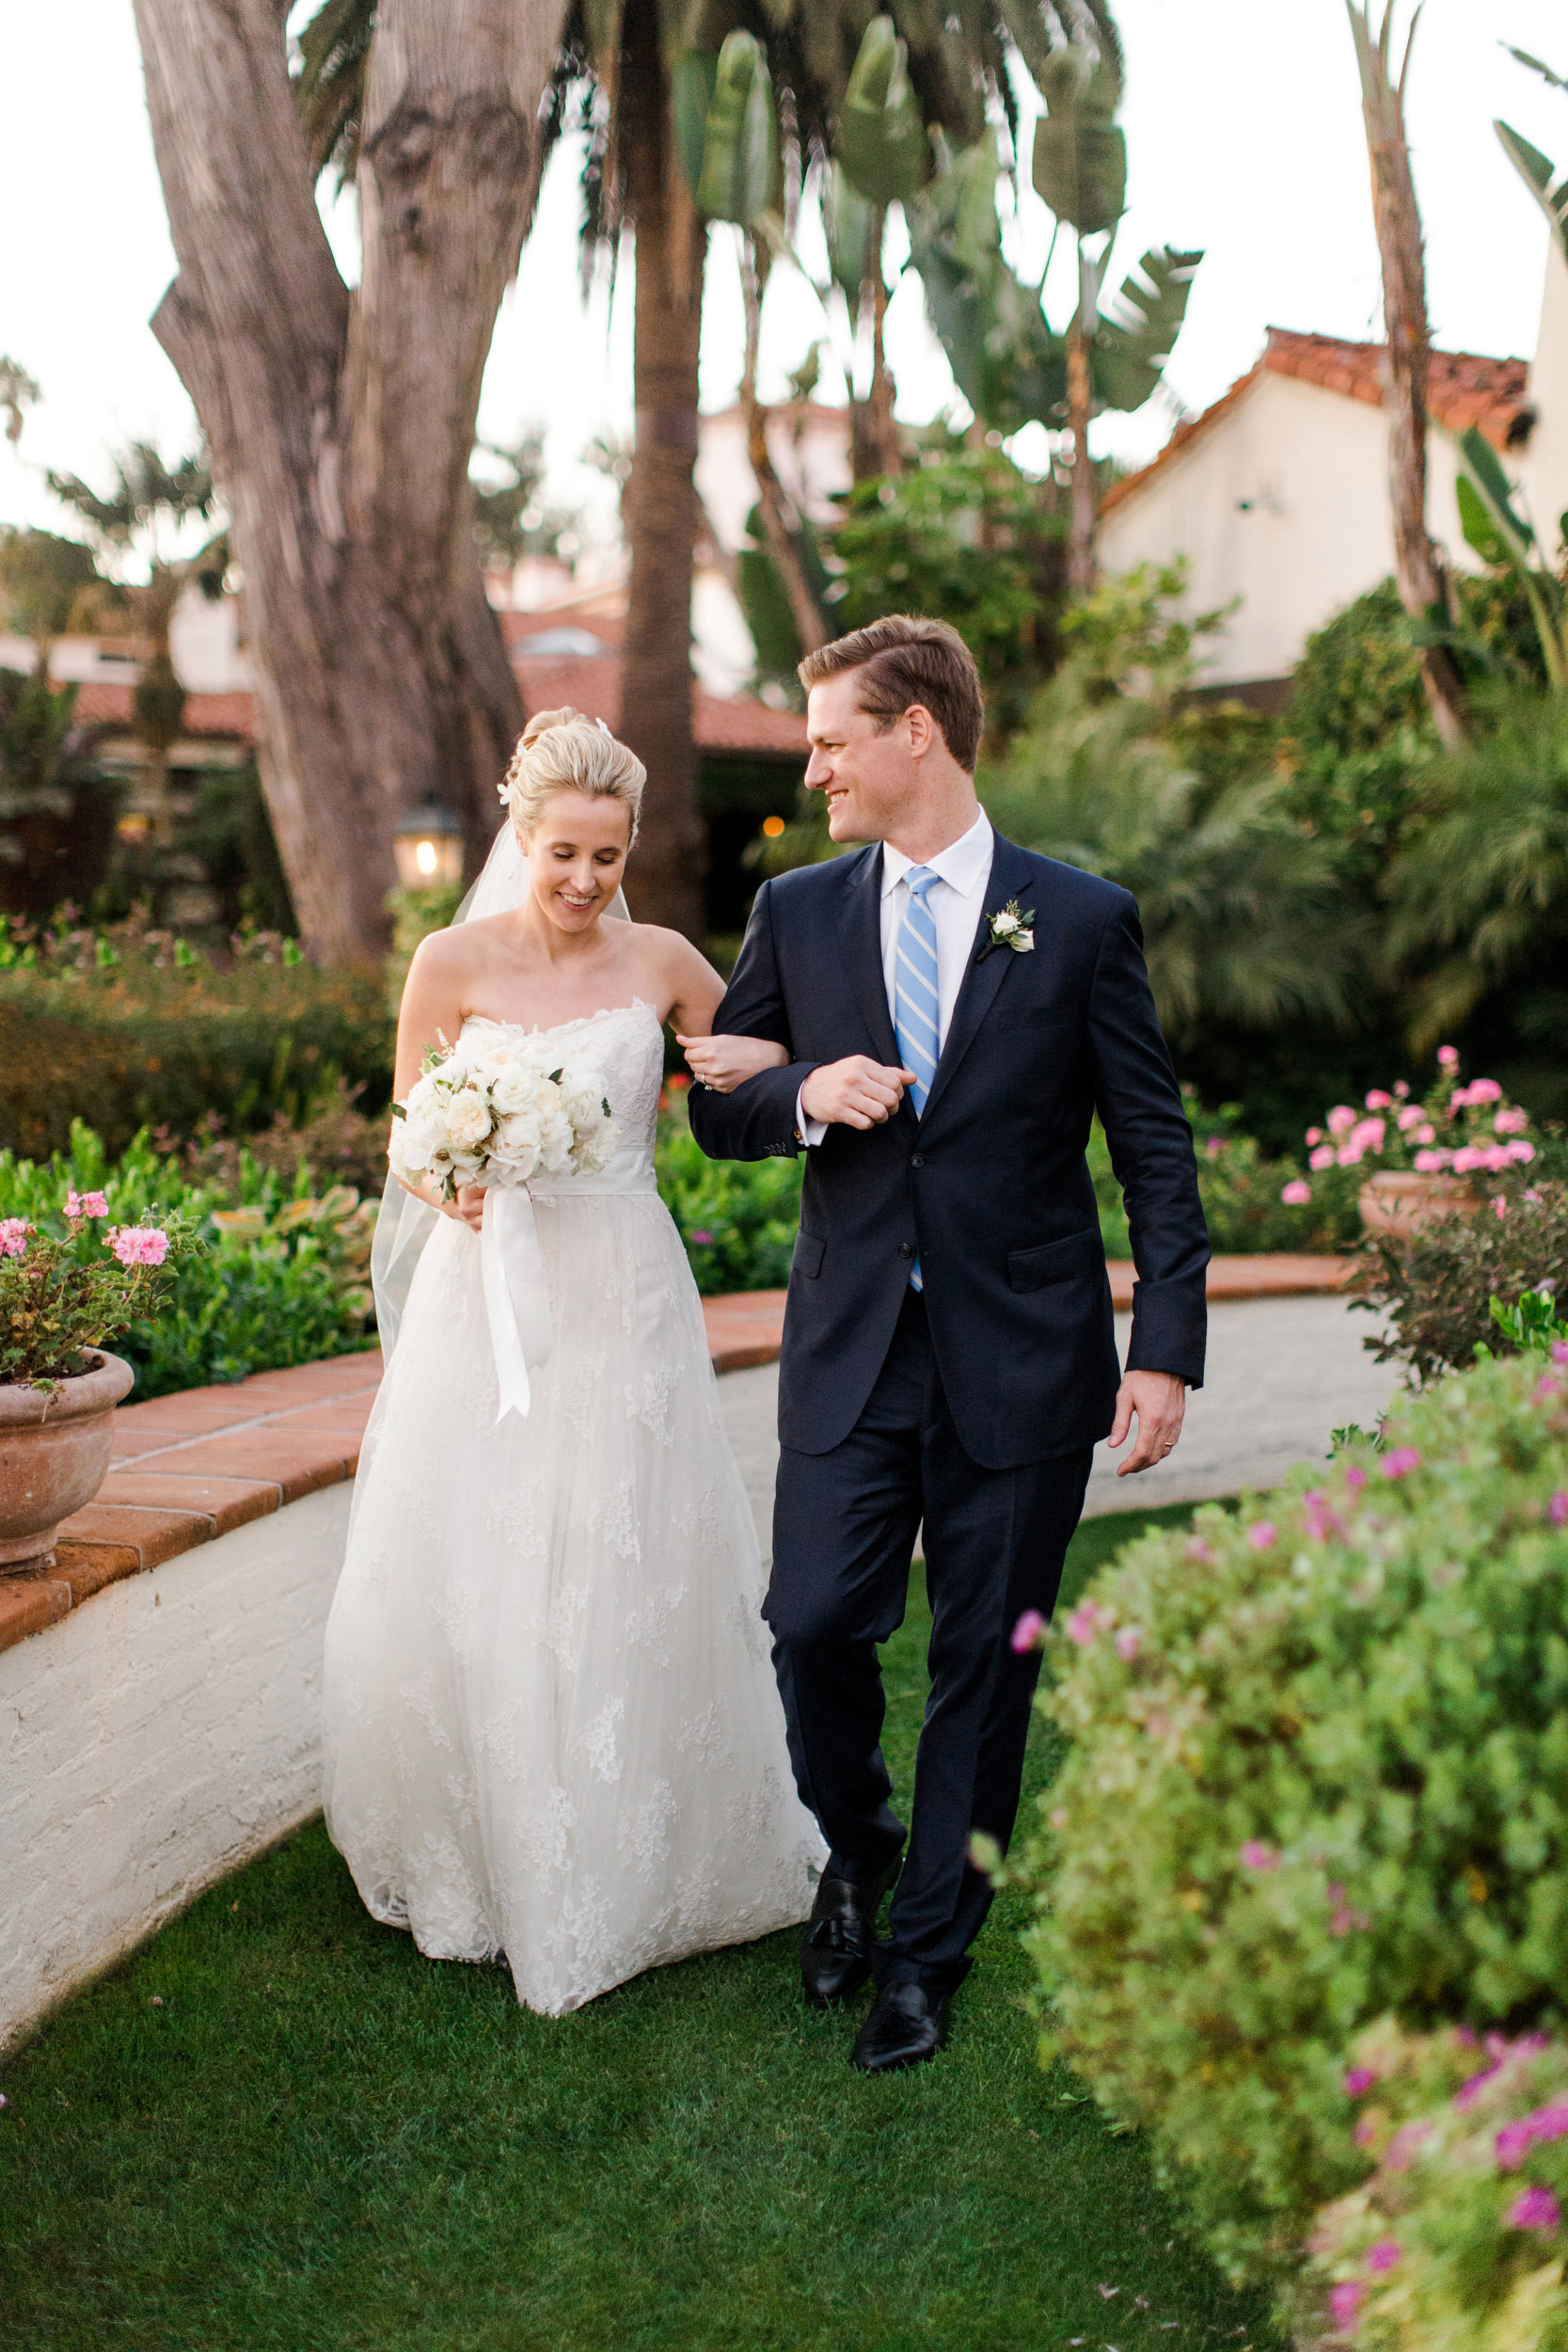 biltmore_santa_barbara_wedding_photos_coral_casino_038.jpg